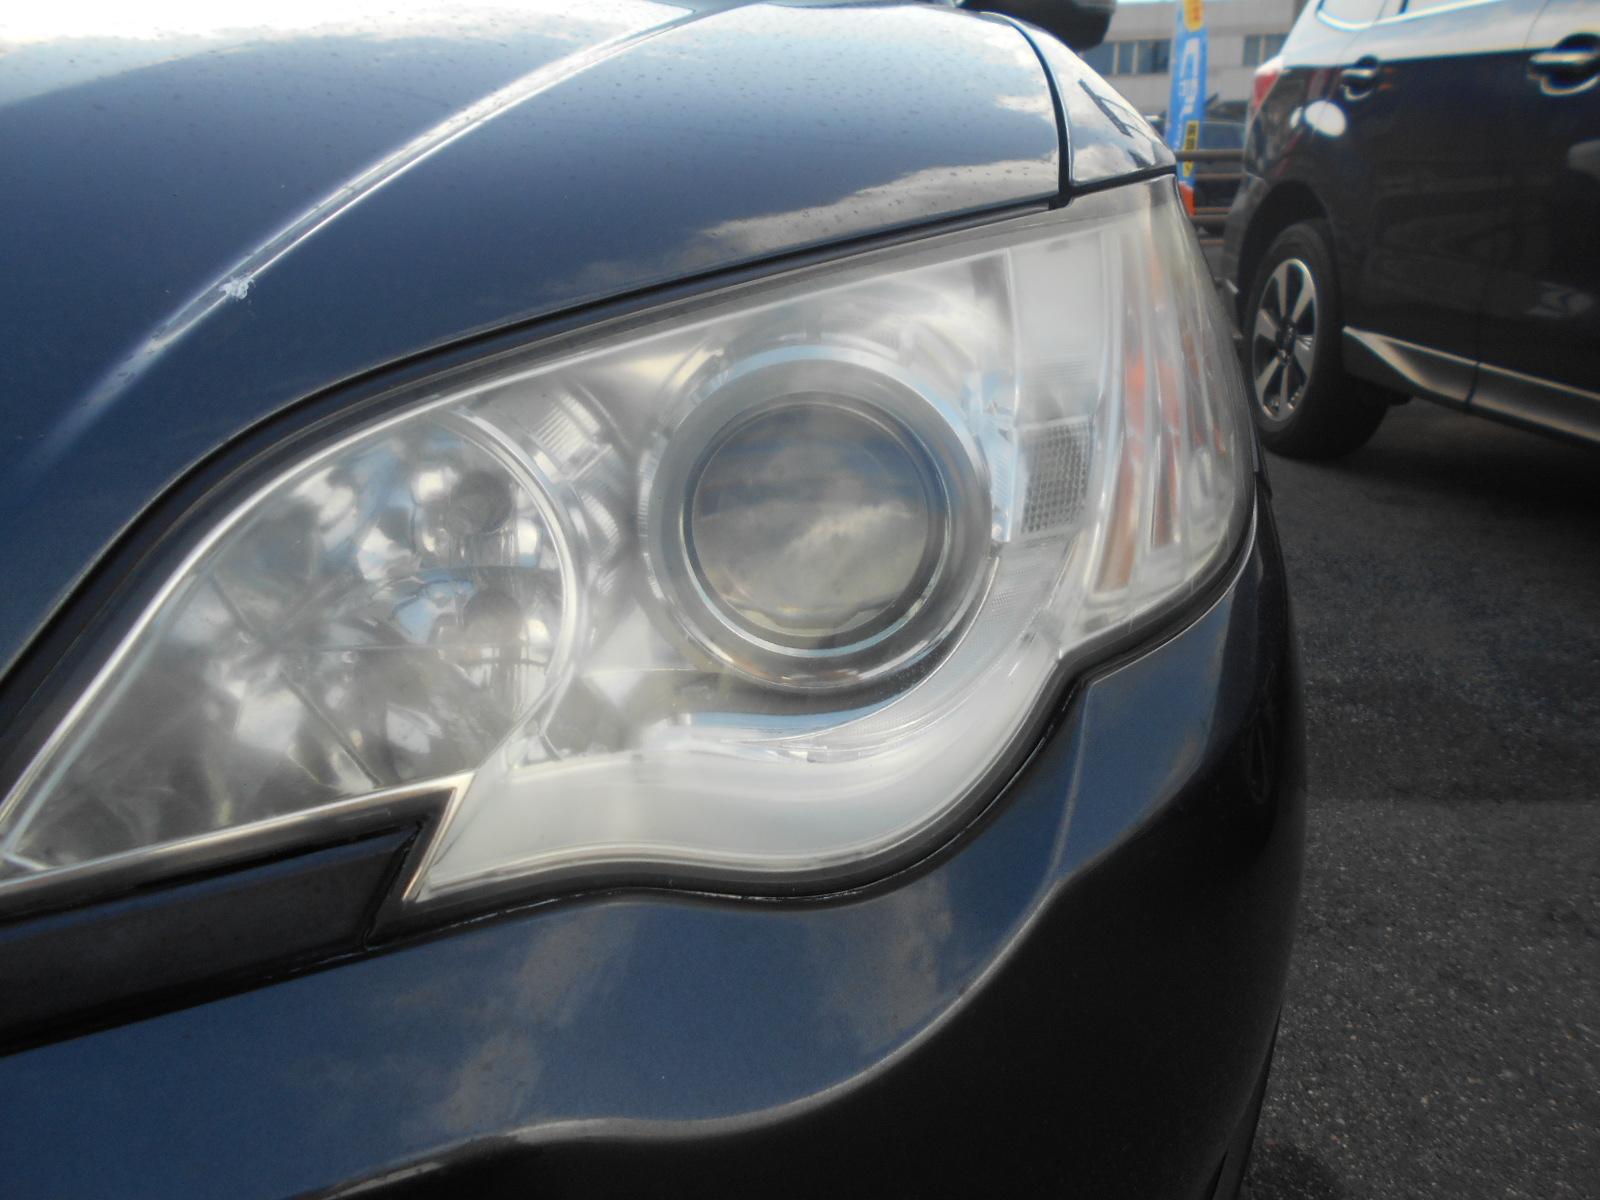 LEDヘッドライトとHIDヘッドライトの見分け方